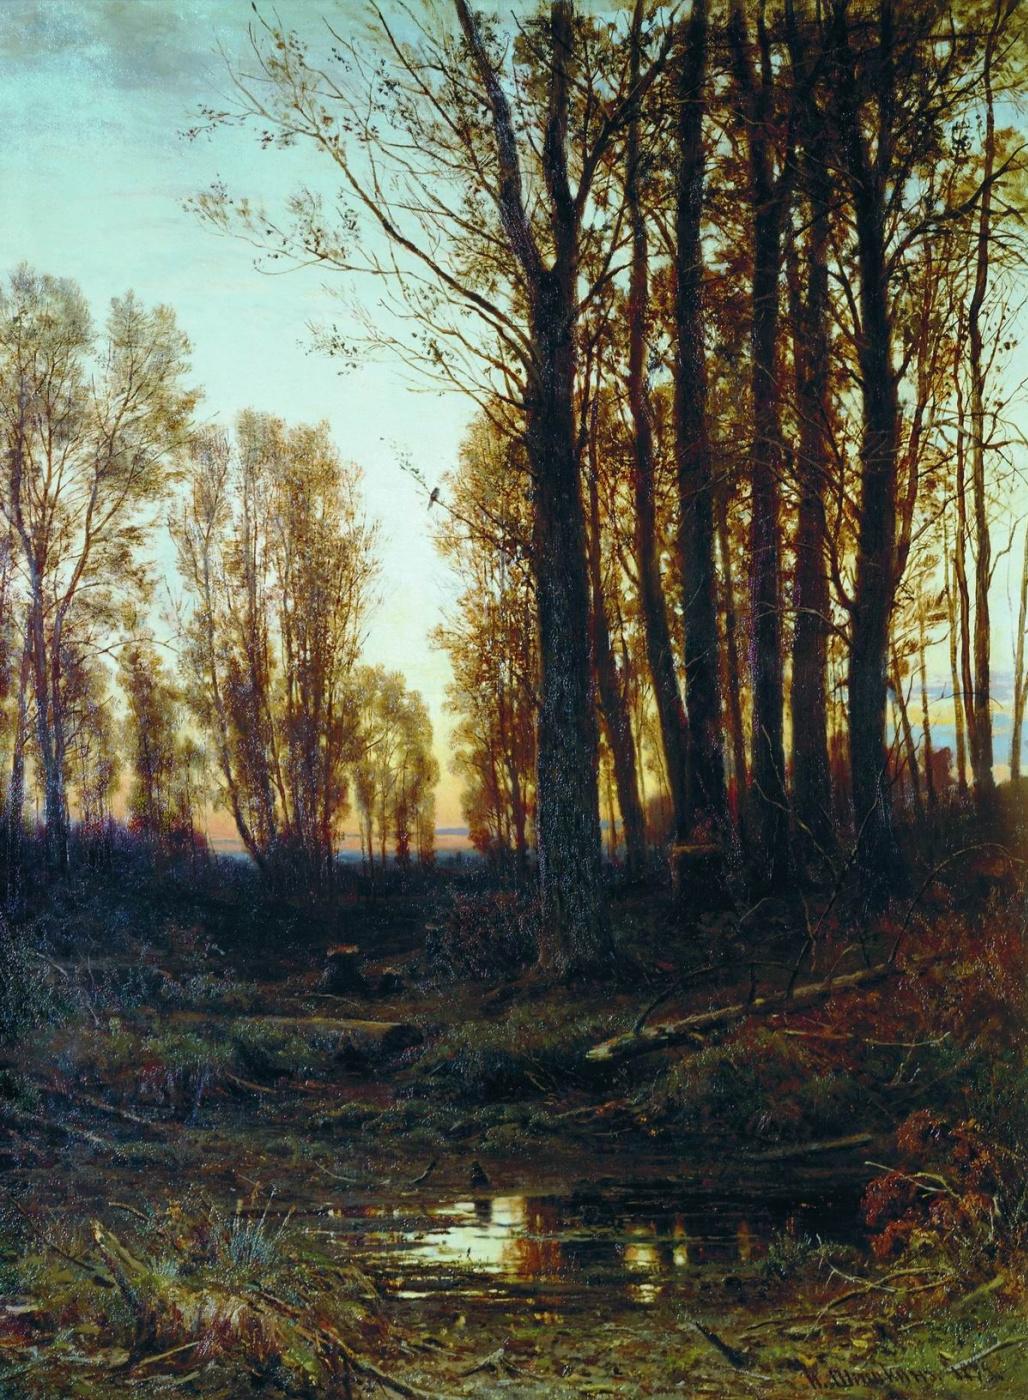 Ivan Shishkin. Twilight. Sunset